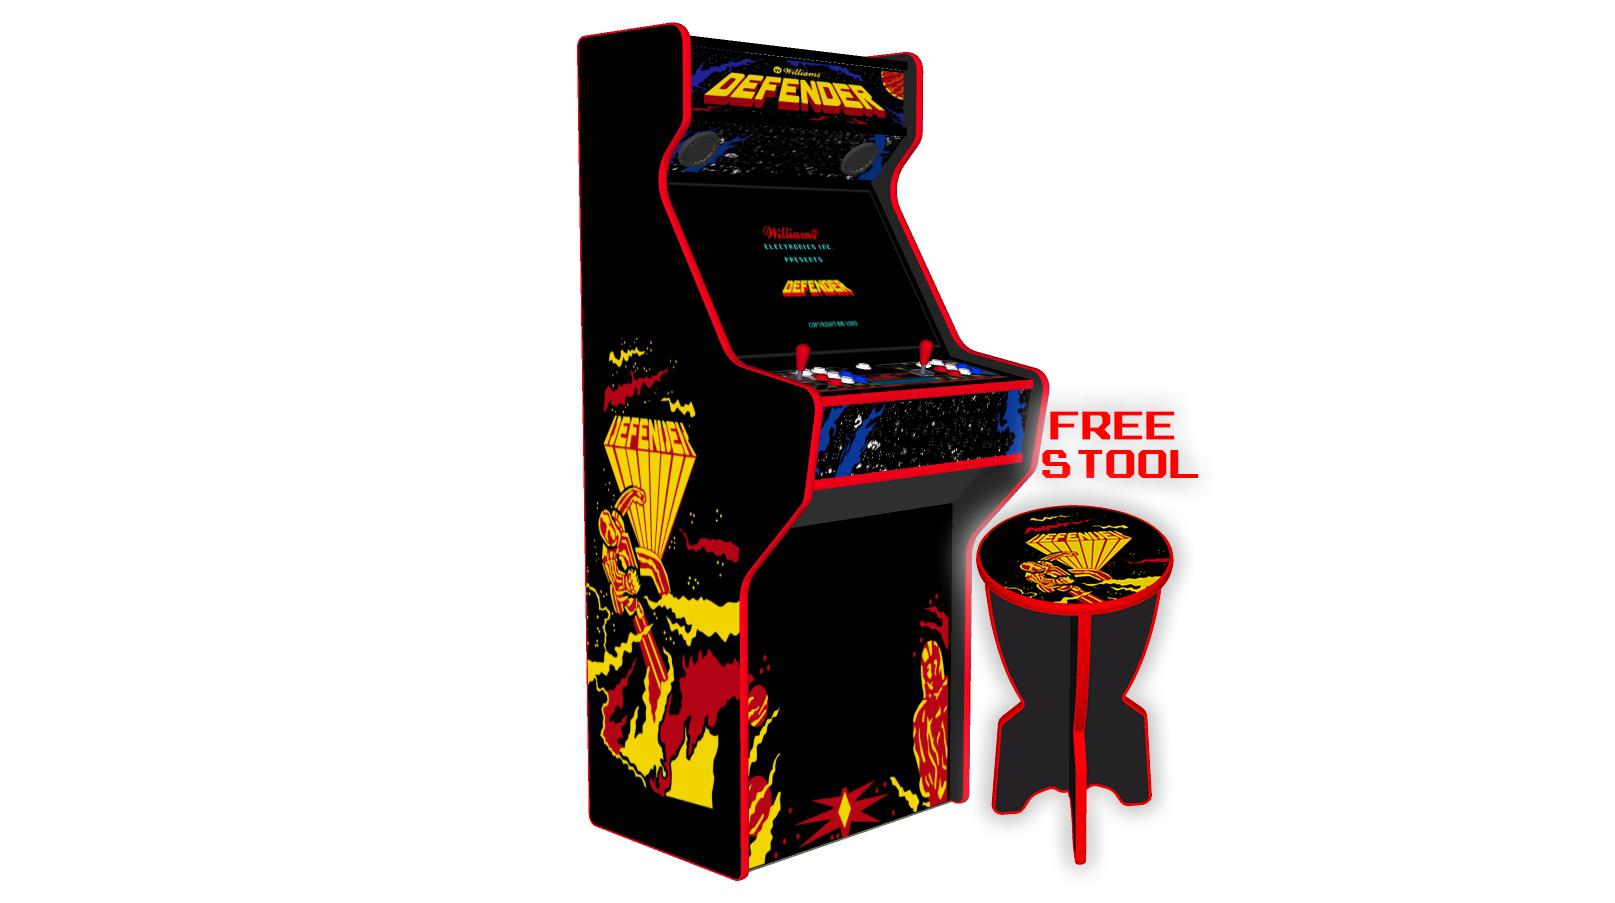 Defender - 27 Inch Upright Arcade Machine - American Style Joysticks - Red Tmold - Left - 15k games